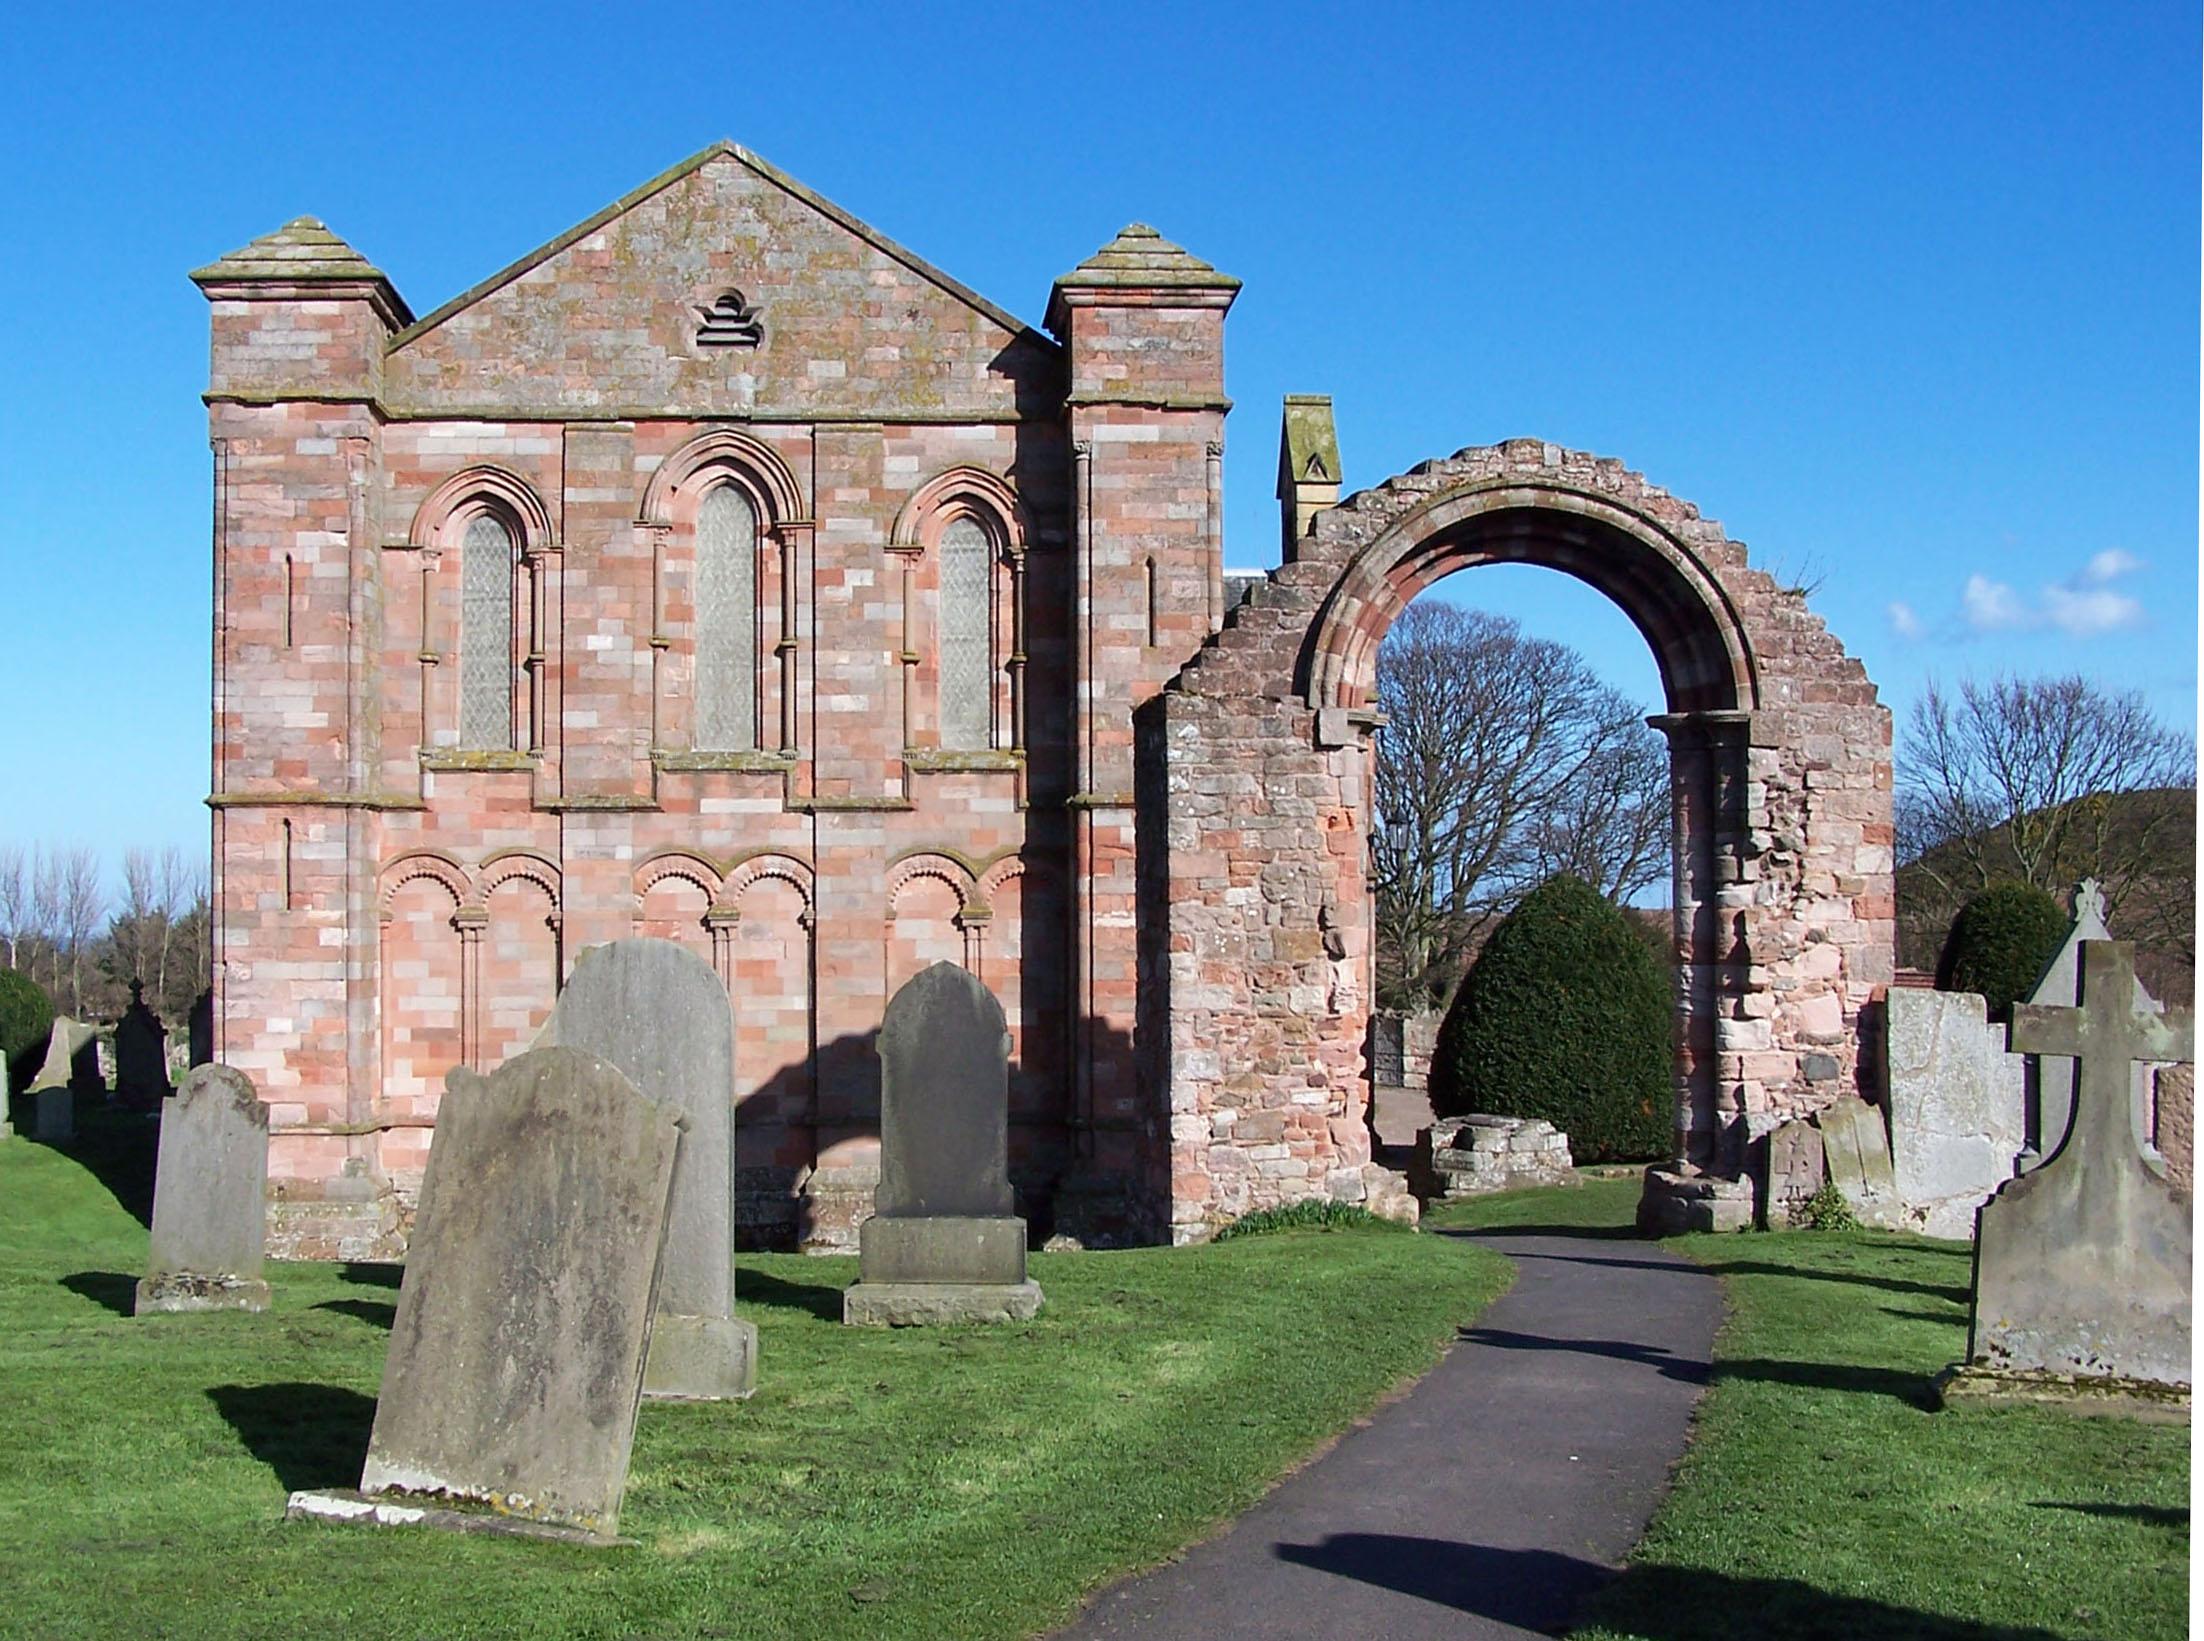 Berwickshire, COLDINGHAM, Coldingham Priory